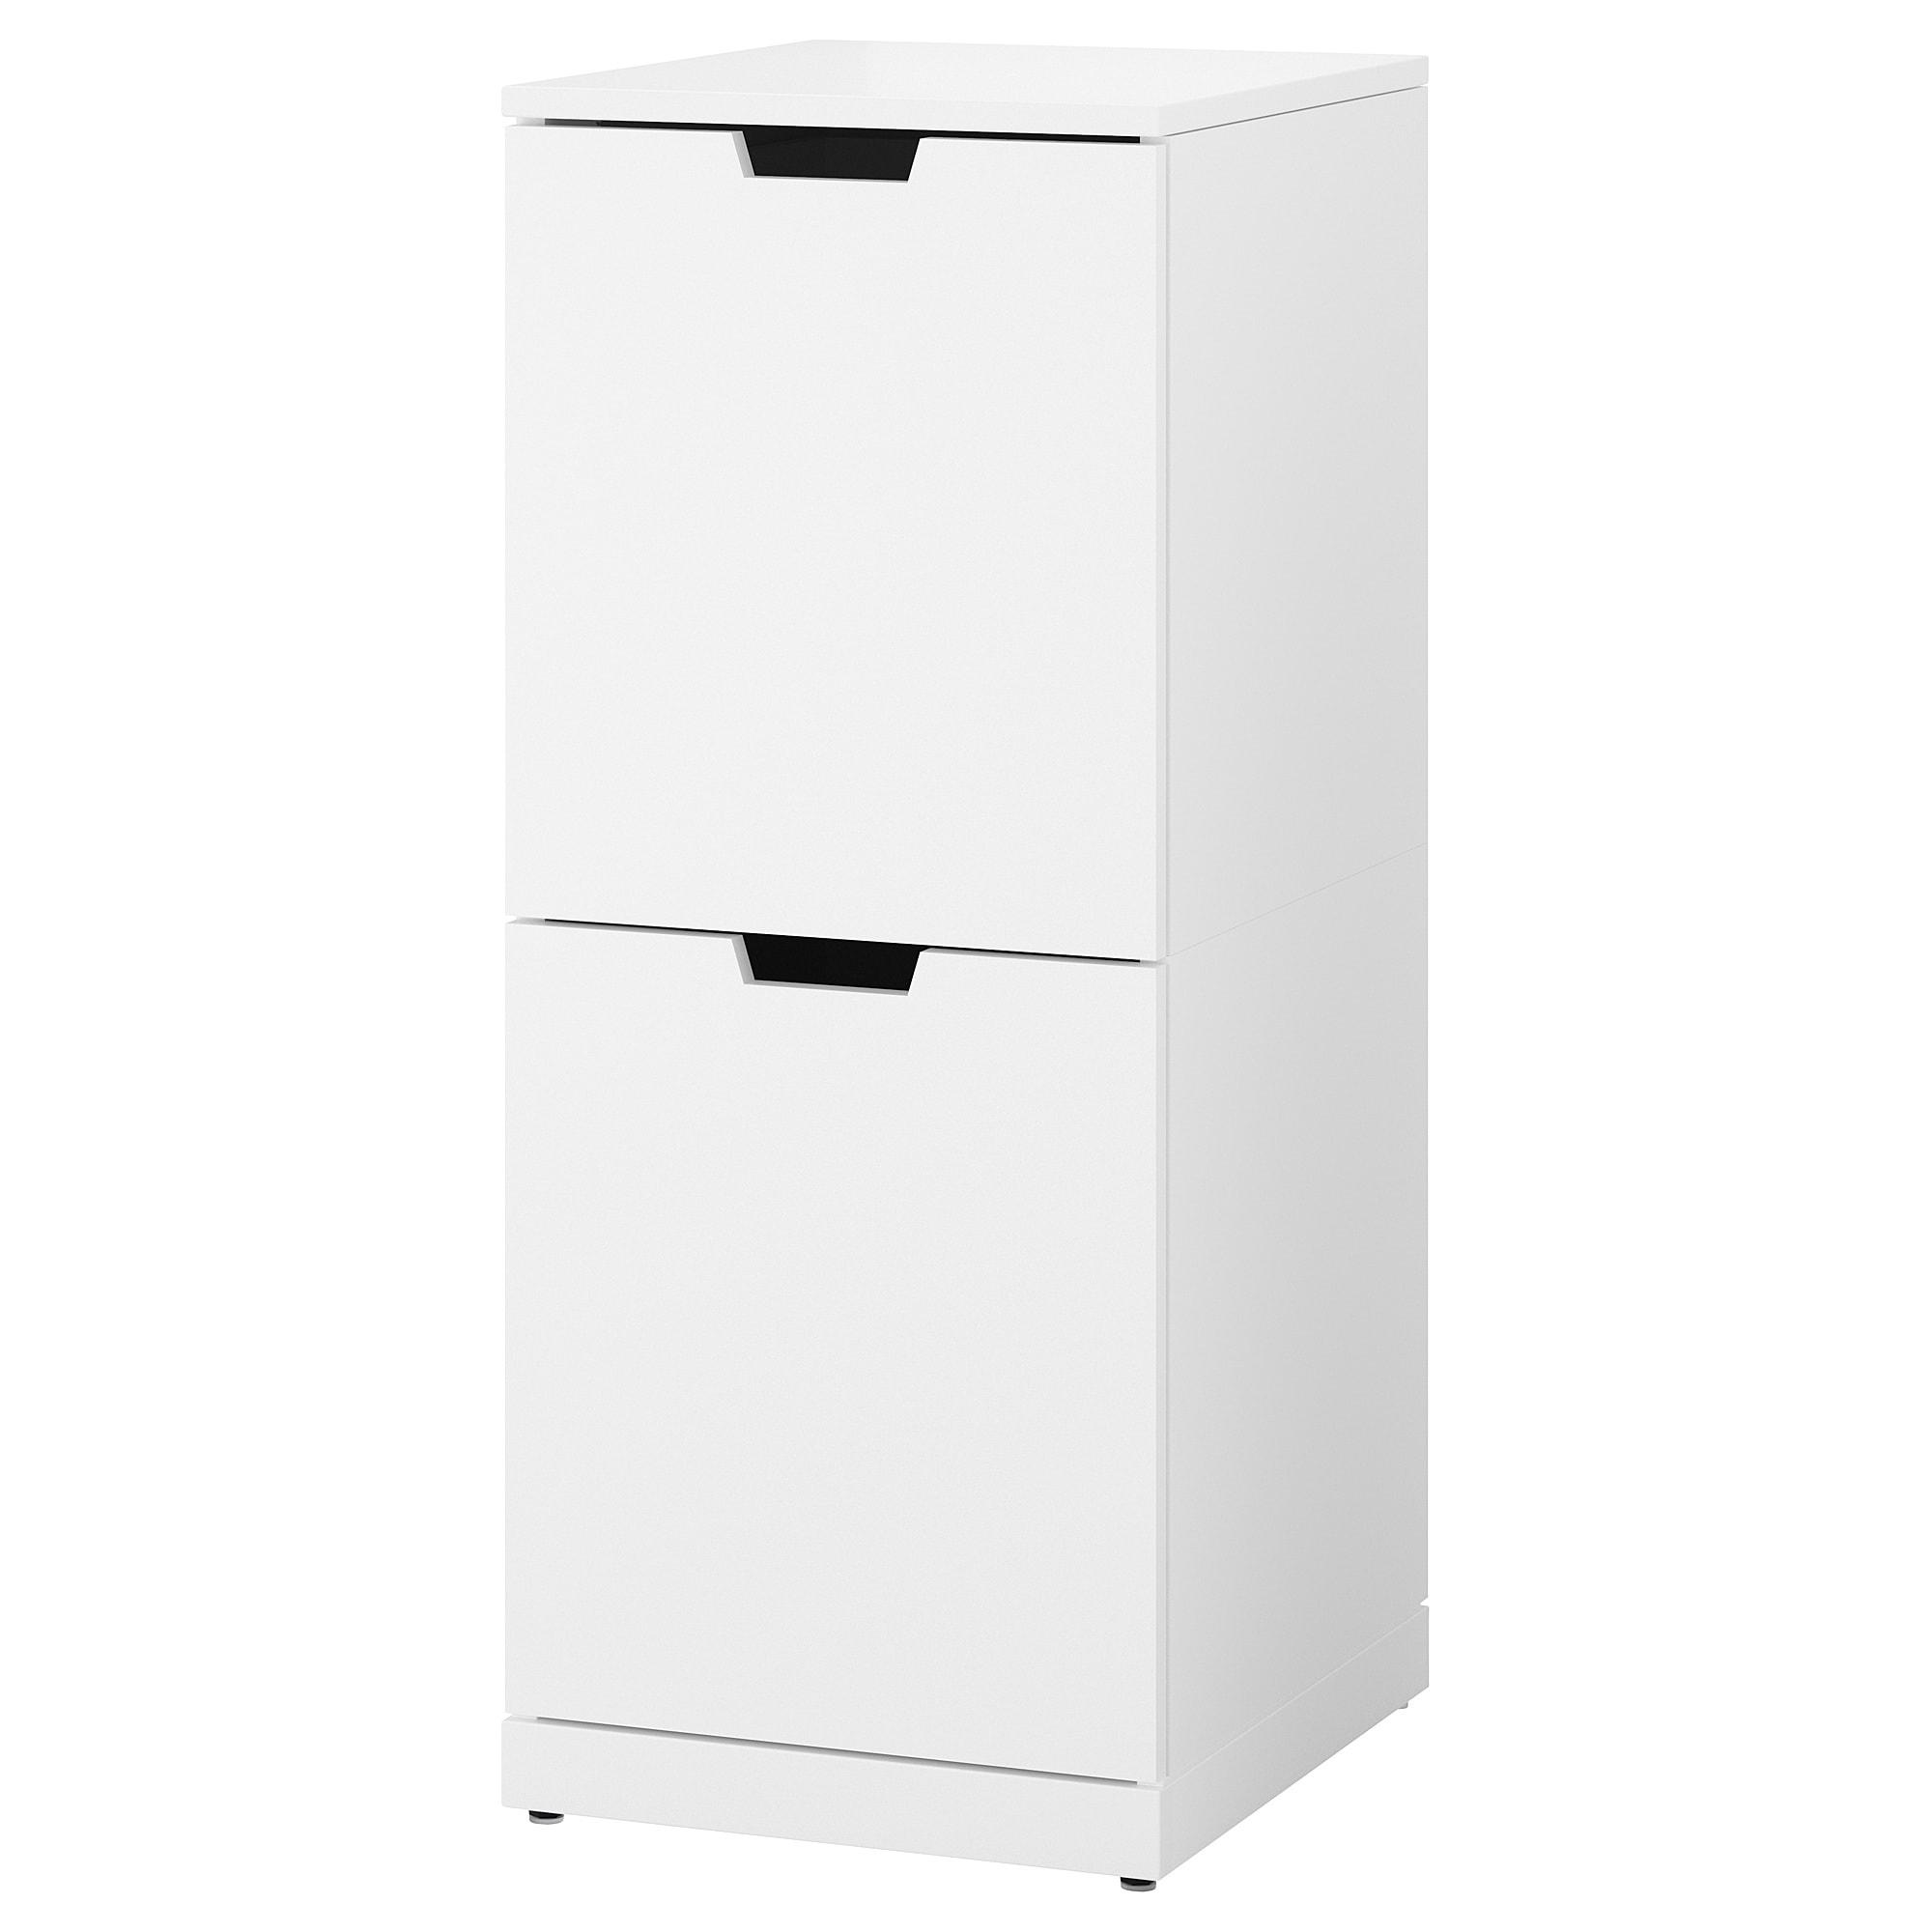 Комод с 2 ящиками НОРДЛИ белый артикуль № 092.765.46 в наличии. Онлайн каталог IKEA Минск. Недорогая доставка и монтаж.